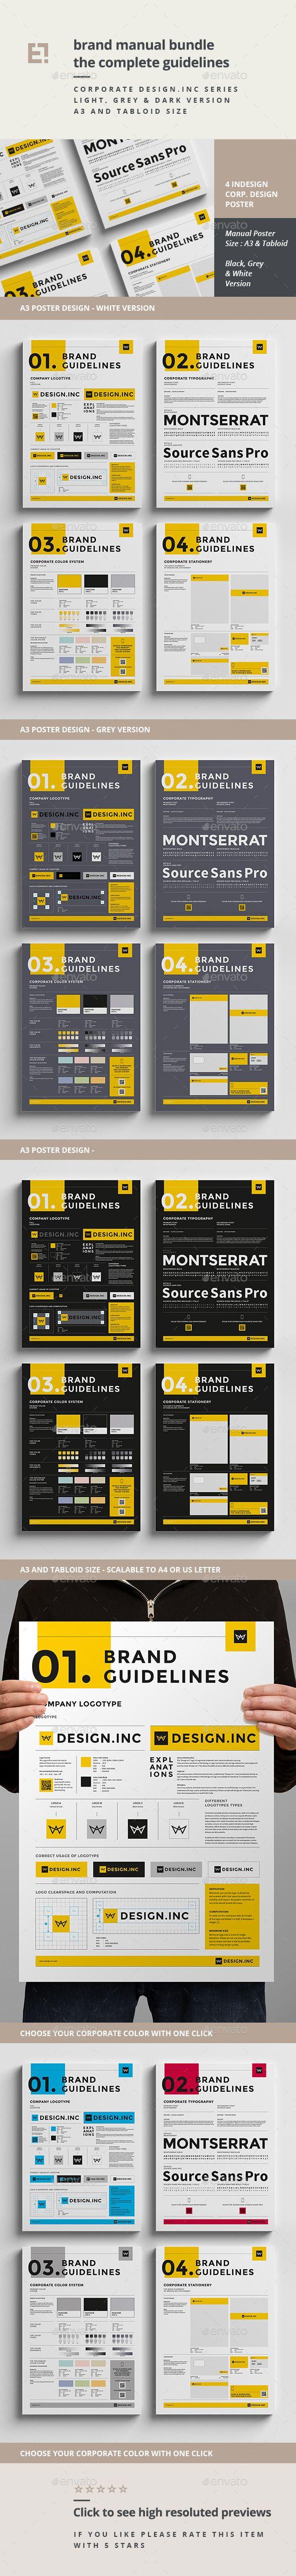 Brand Manual Bundle | Brand manual, Adobe indesign and Adobe